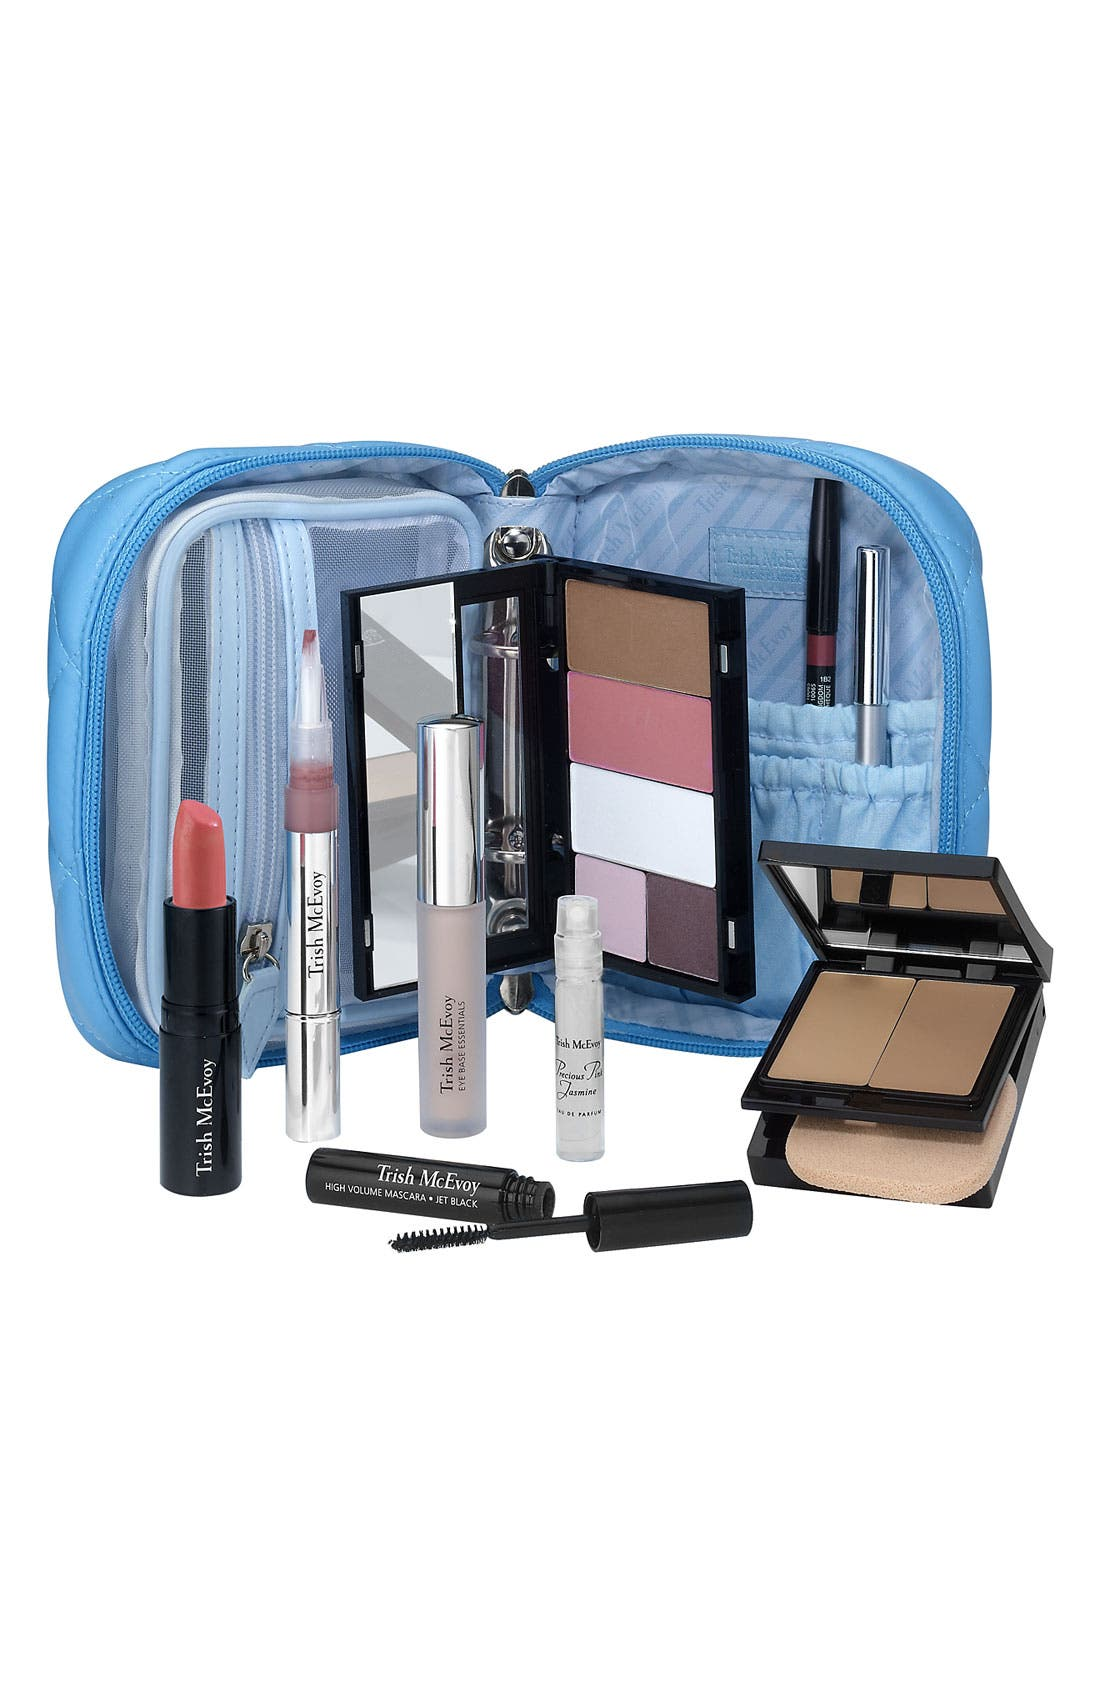 Main Image - Trish McEvoy 'Effortless Beauty - Flirt' Makeup Planner